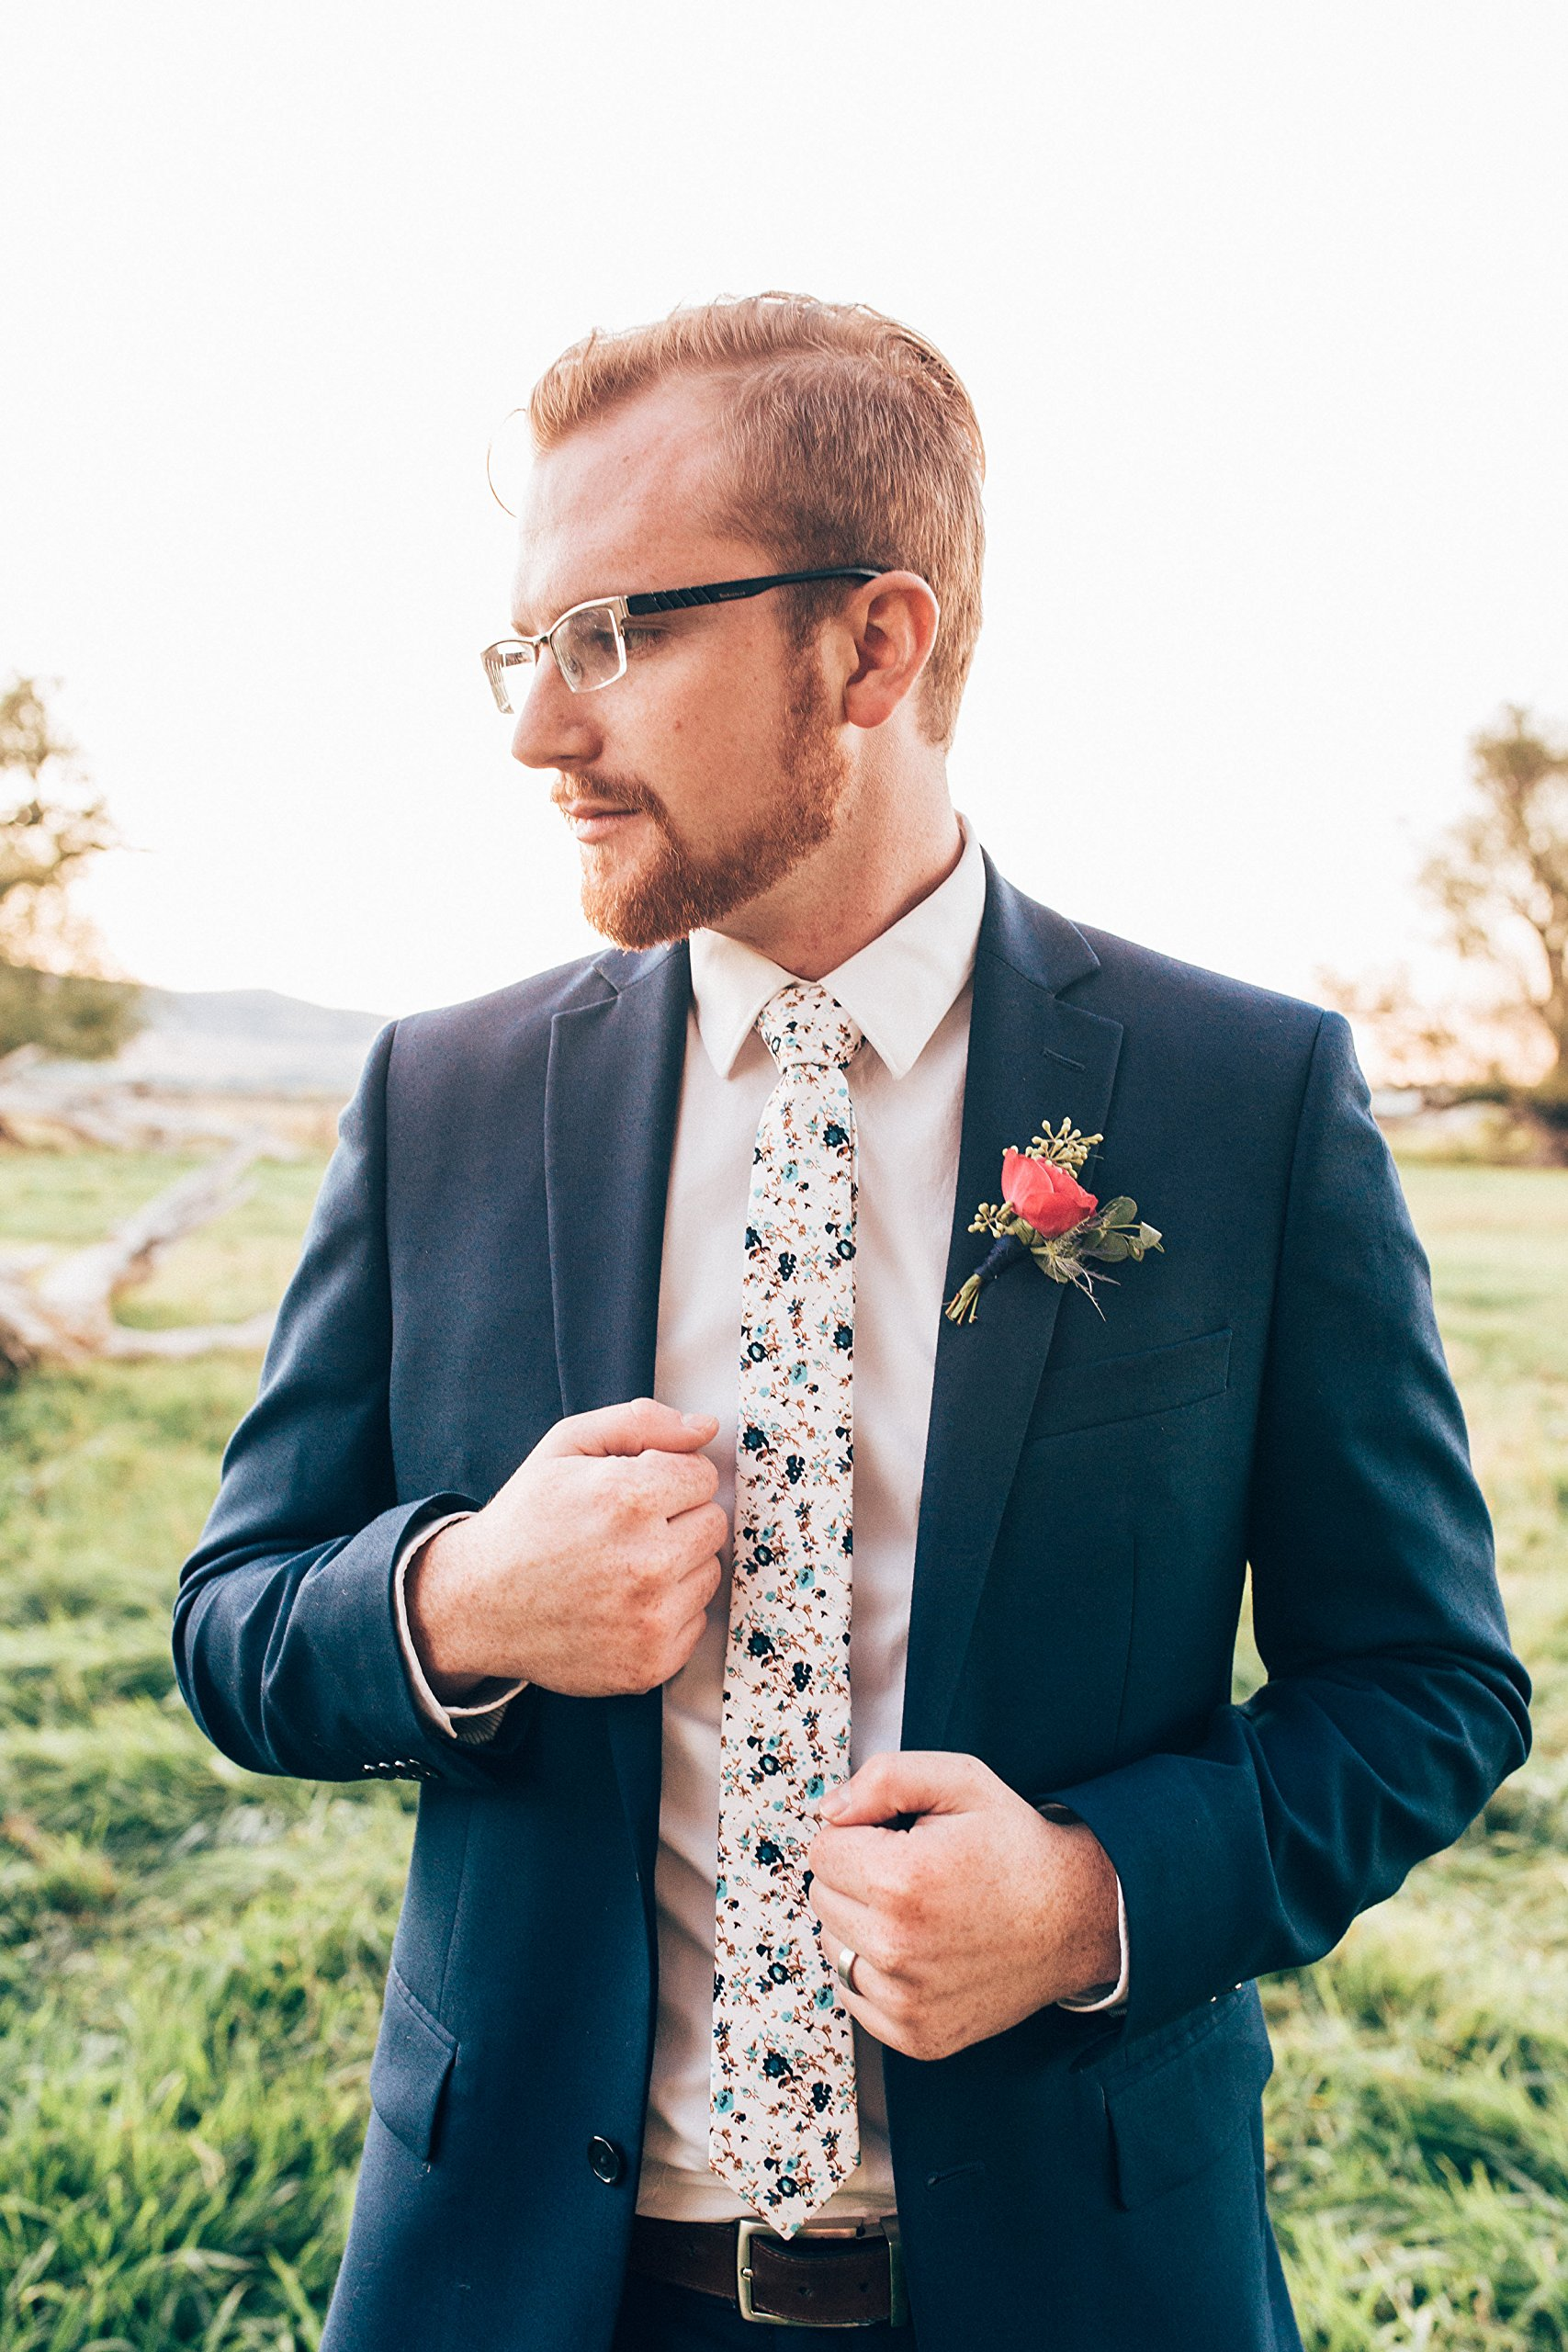 DAZI Men's Skinny Tie Floral Print Cotton Necktie, Great for Weddings, Groom, Groomsmen, Missions, Dances, Gifts. (Blue Bloom) by DAZI (Image #5)